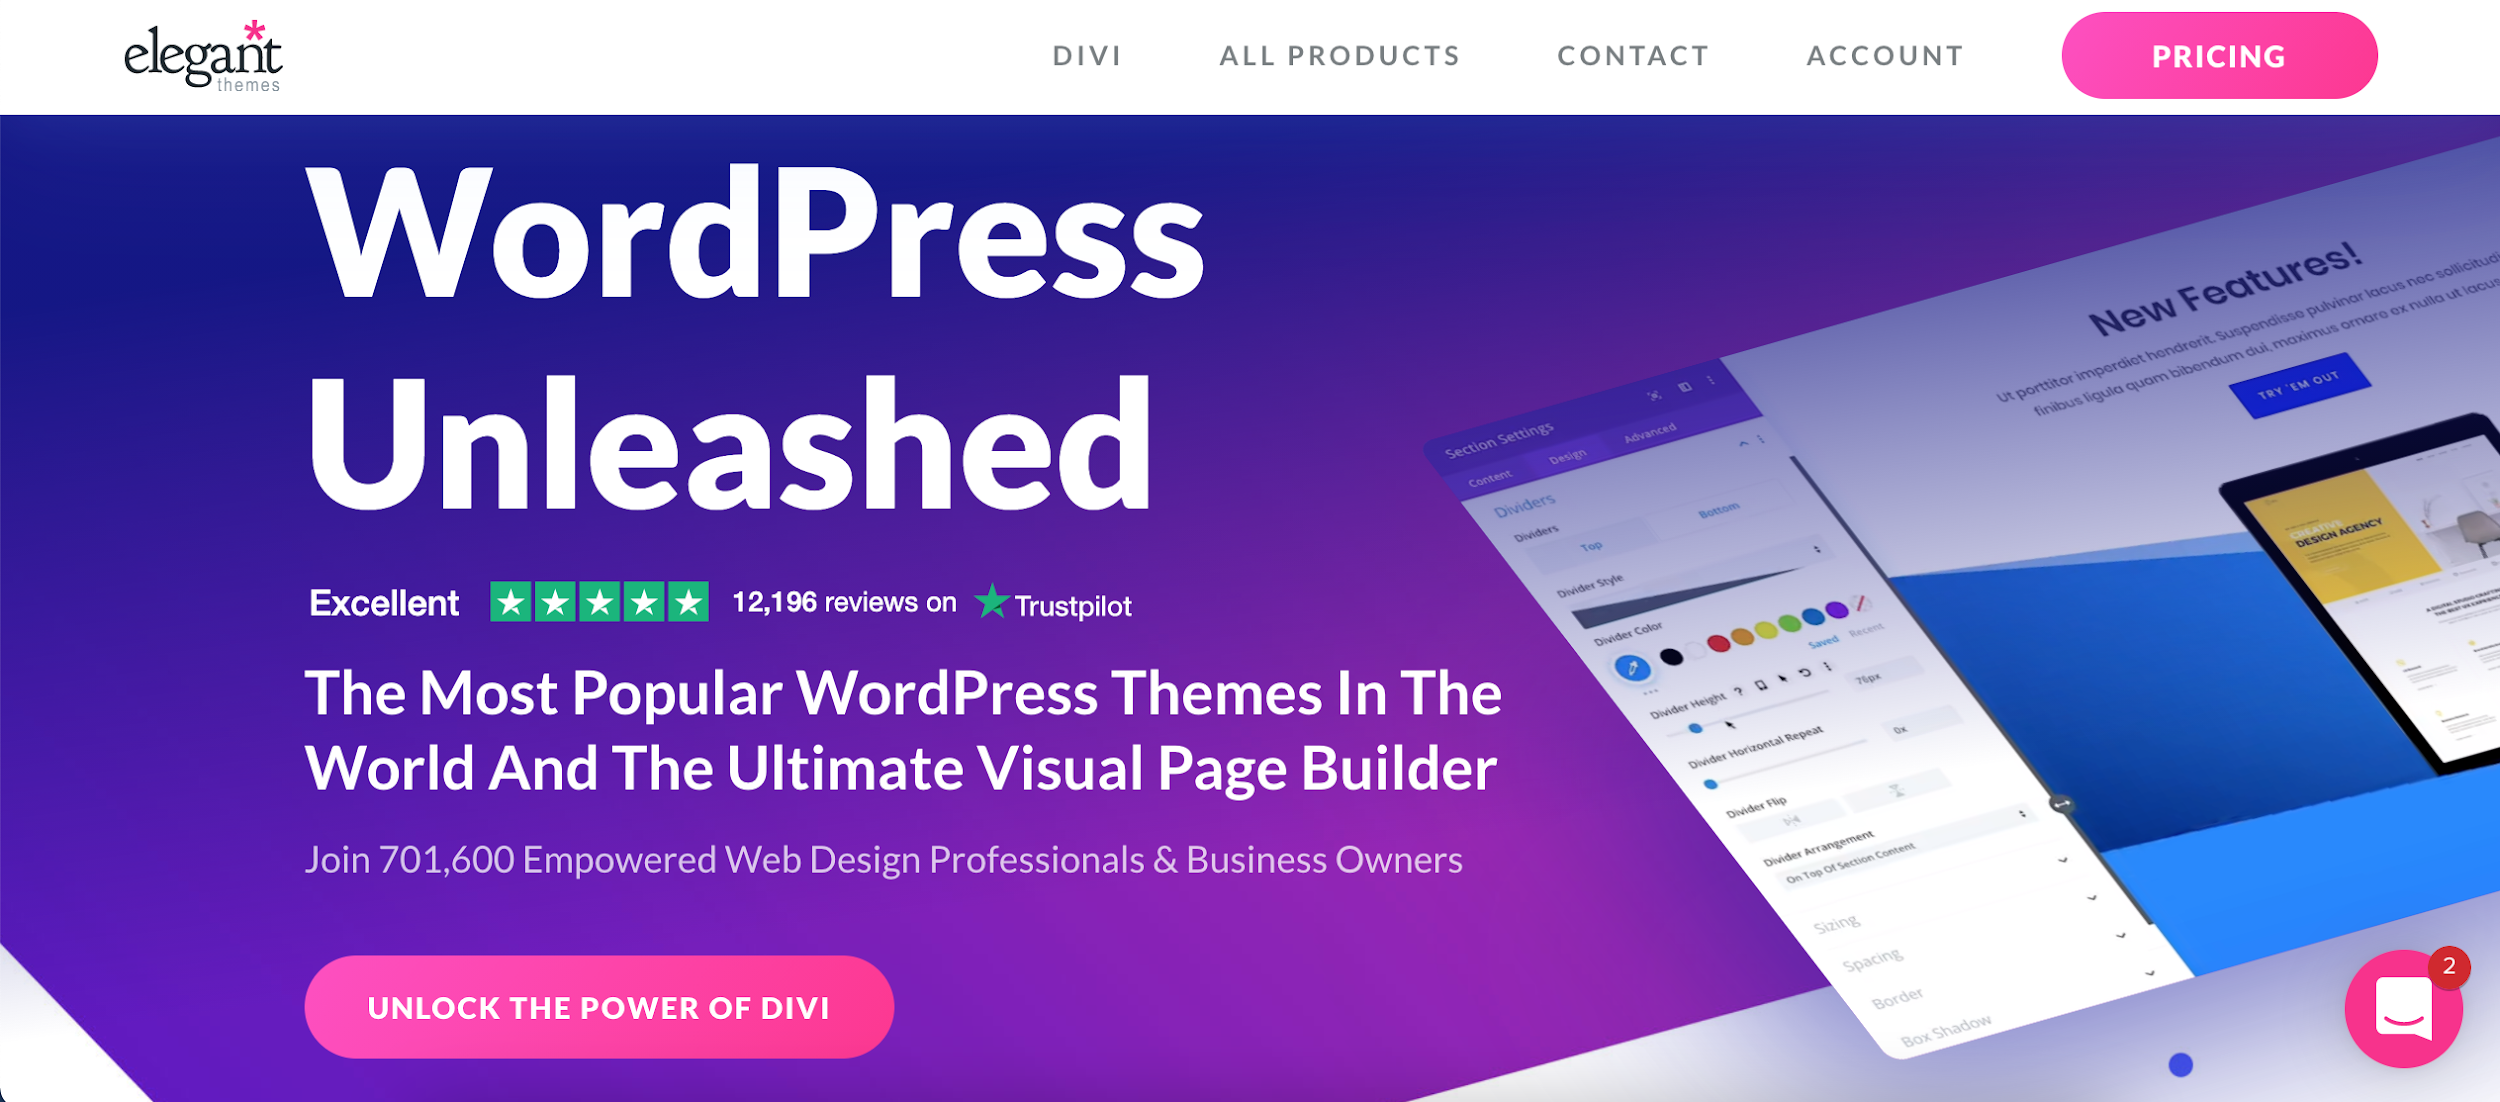 divi page builder essential affiliate marketing tool